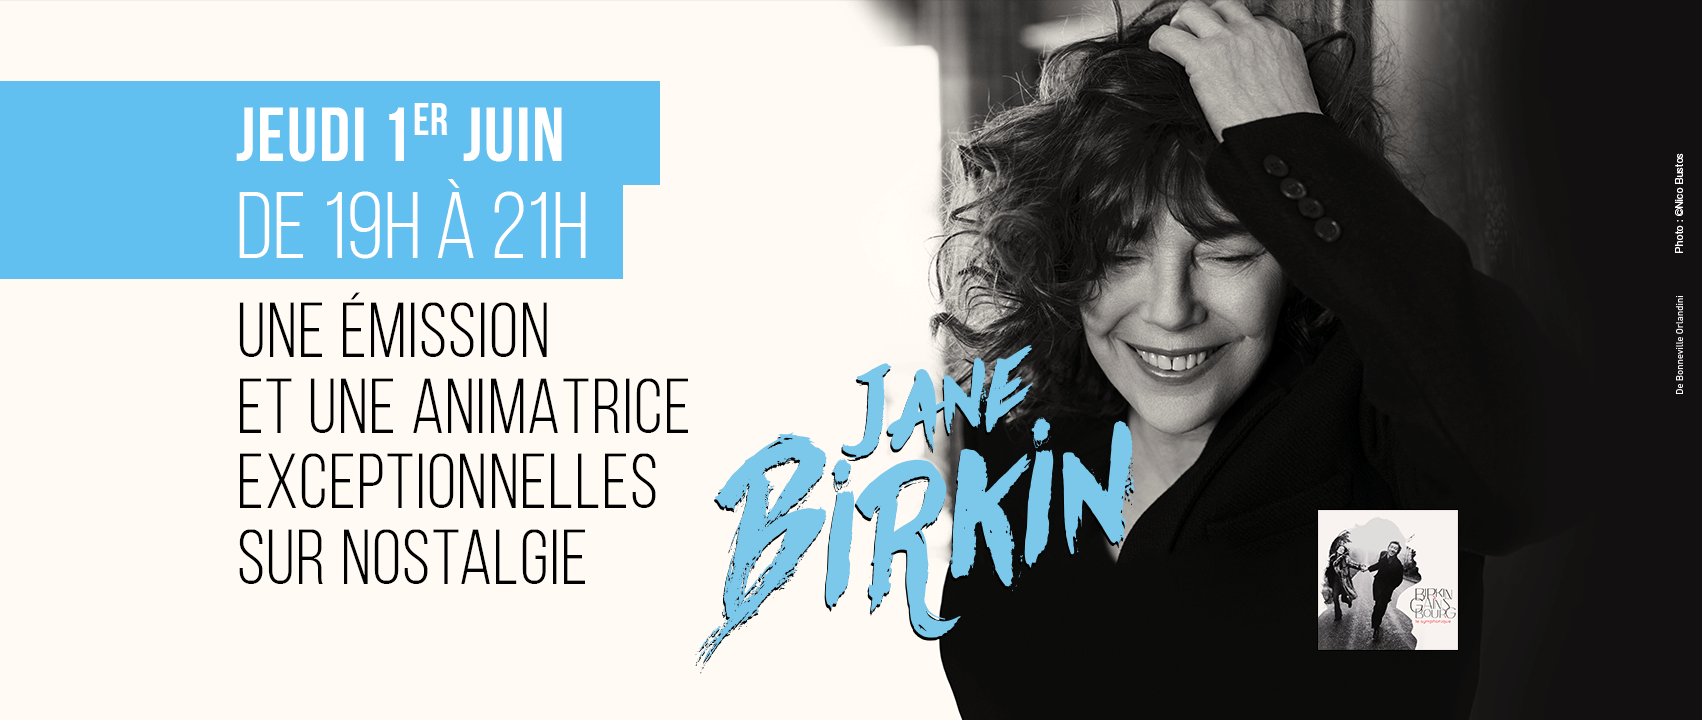 Jane Birkin animatrice sur Nostalgie